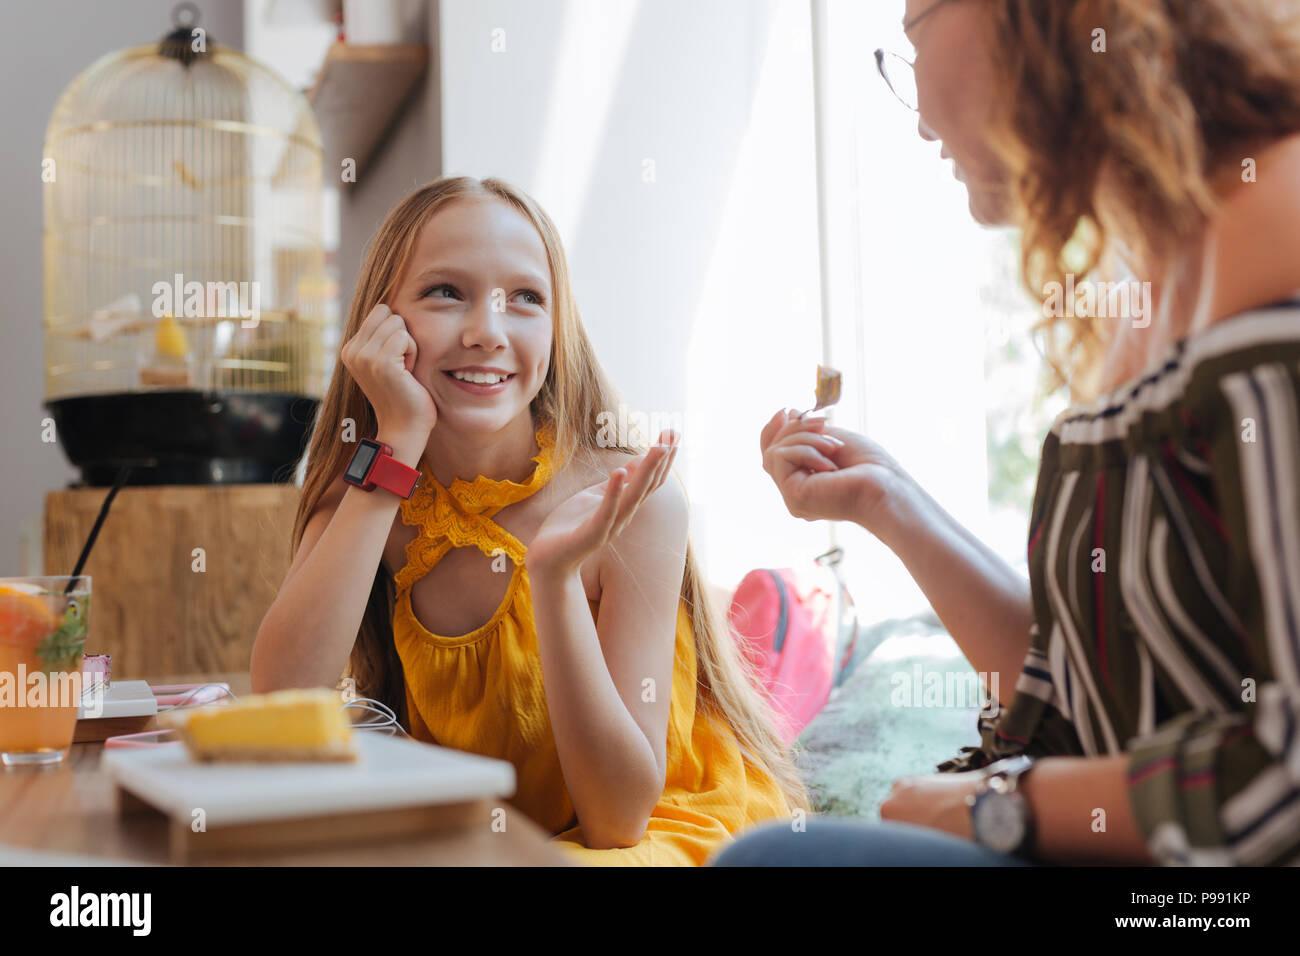 Beaming blonde-haired teenager enjoying talking to her mother - Stock Image